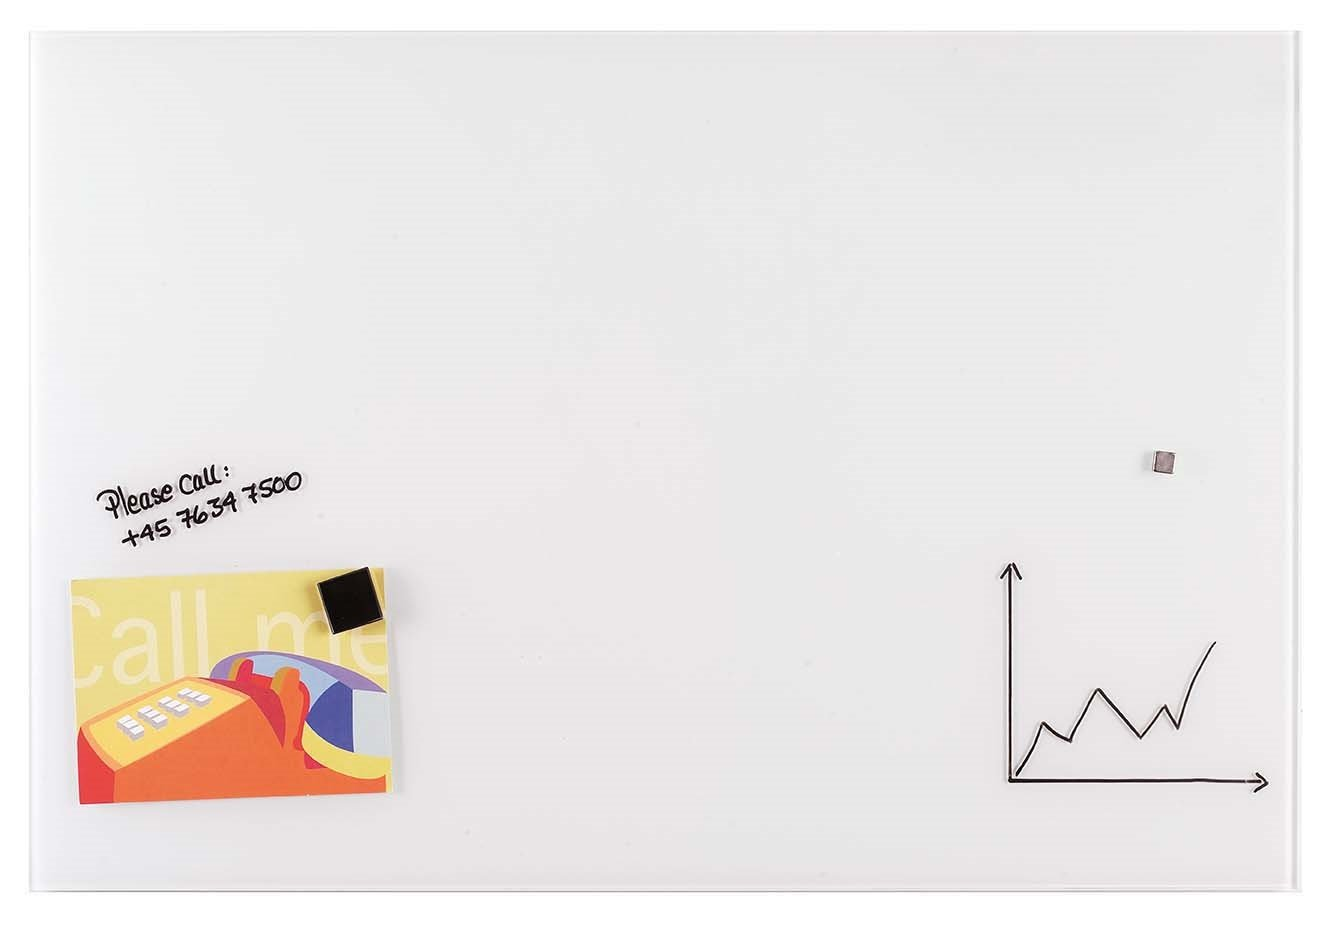 Franken gt10010001/magnetiche Lavagna in Vetro 100/x 100/cm 35 x 35 cm bianco